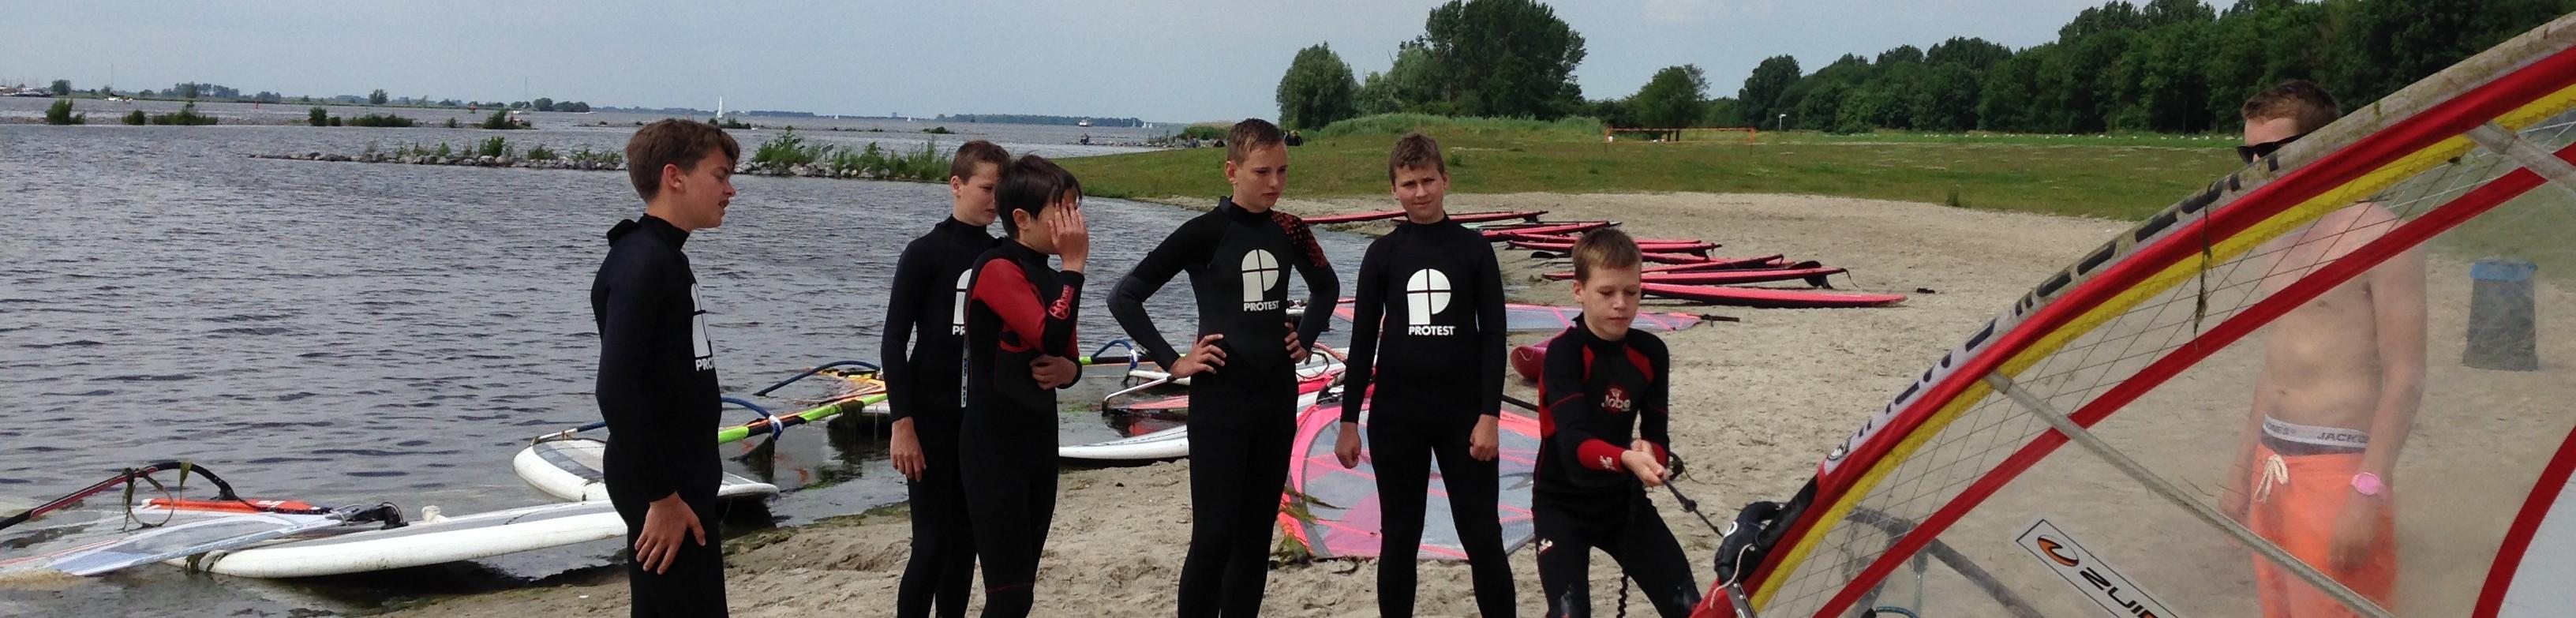 Windsurfschool   Windsurflessen   Eemhof Watersport